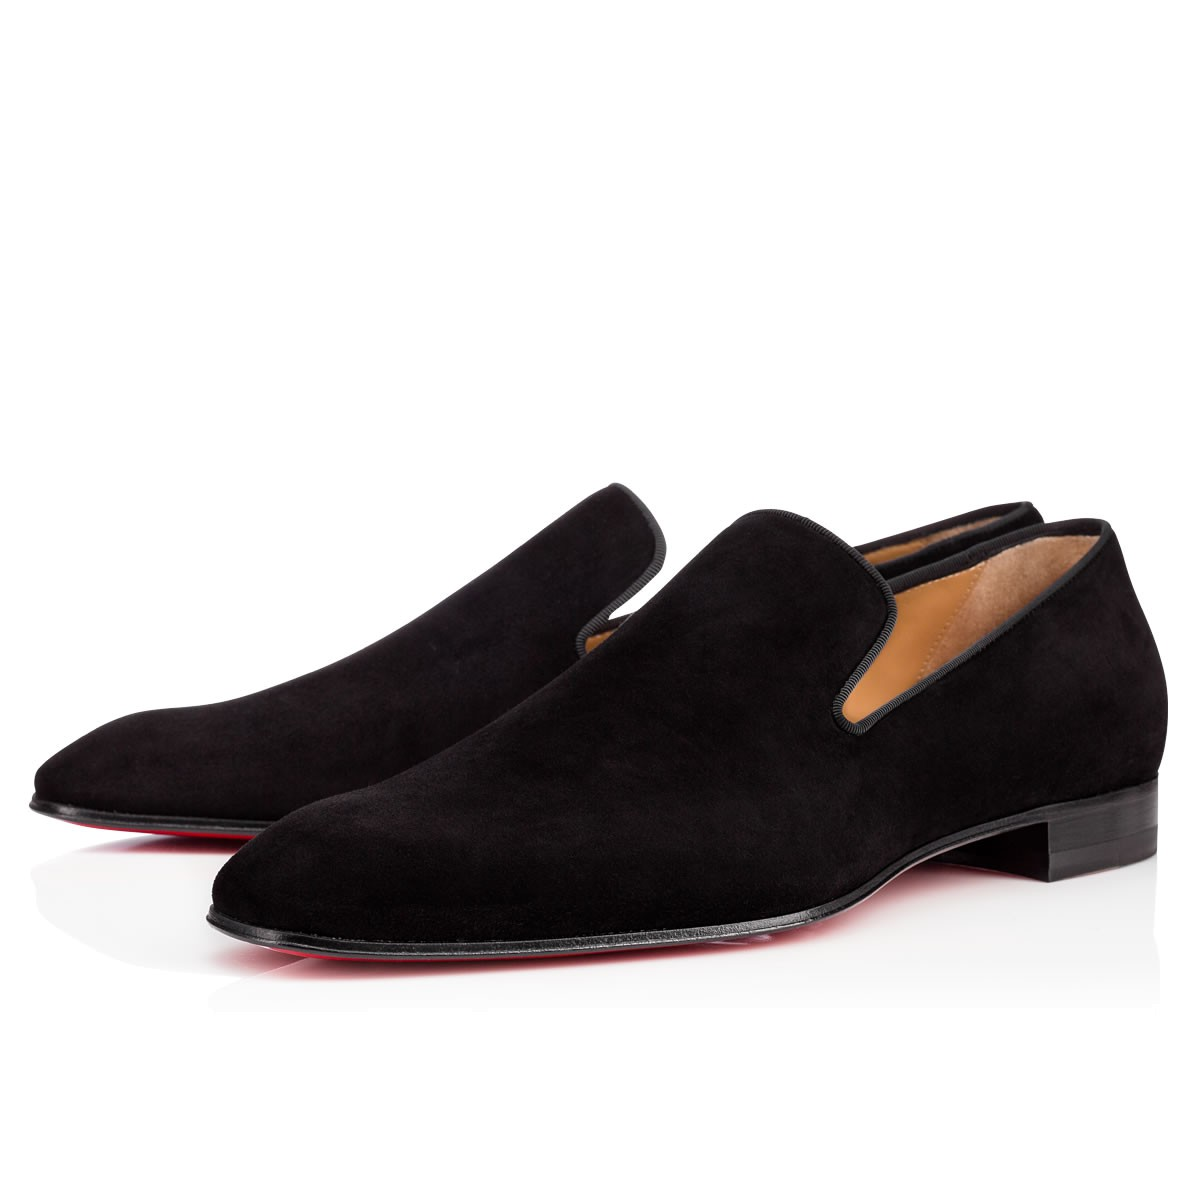 Men Shoes - Dandelion - Christian Louboutin